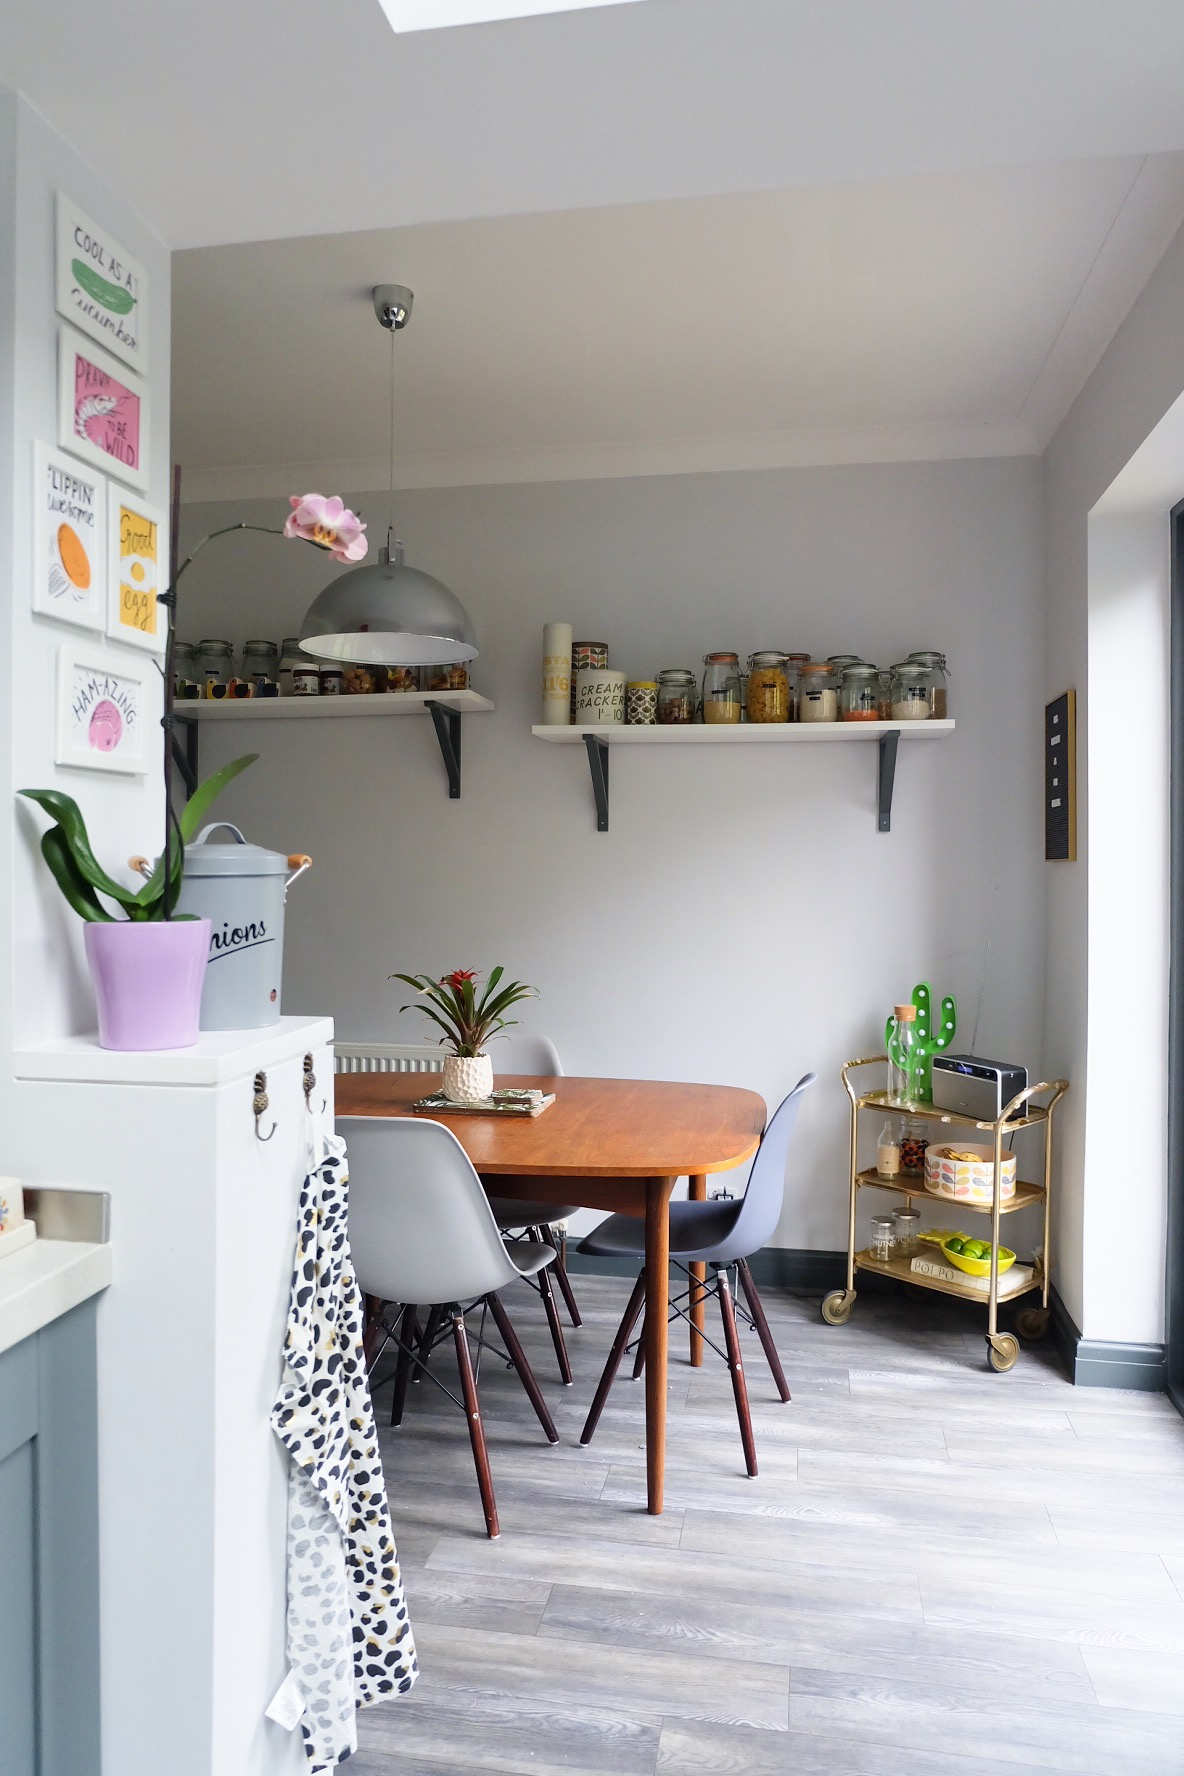 DIY: Ikea Hack Kitchen Shelves